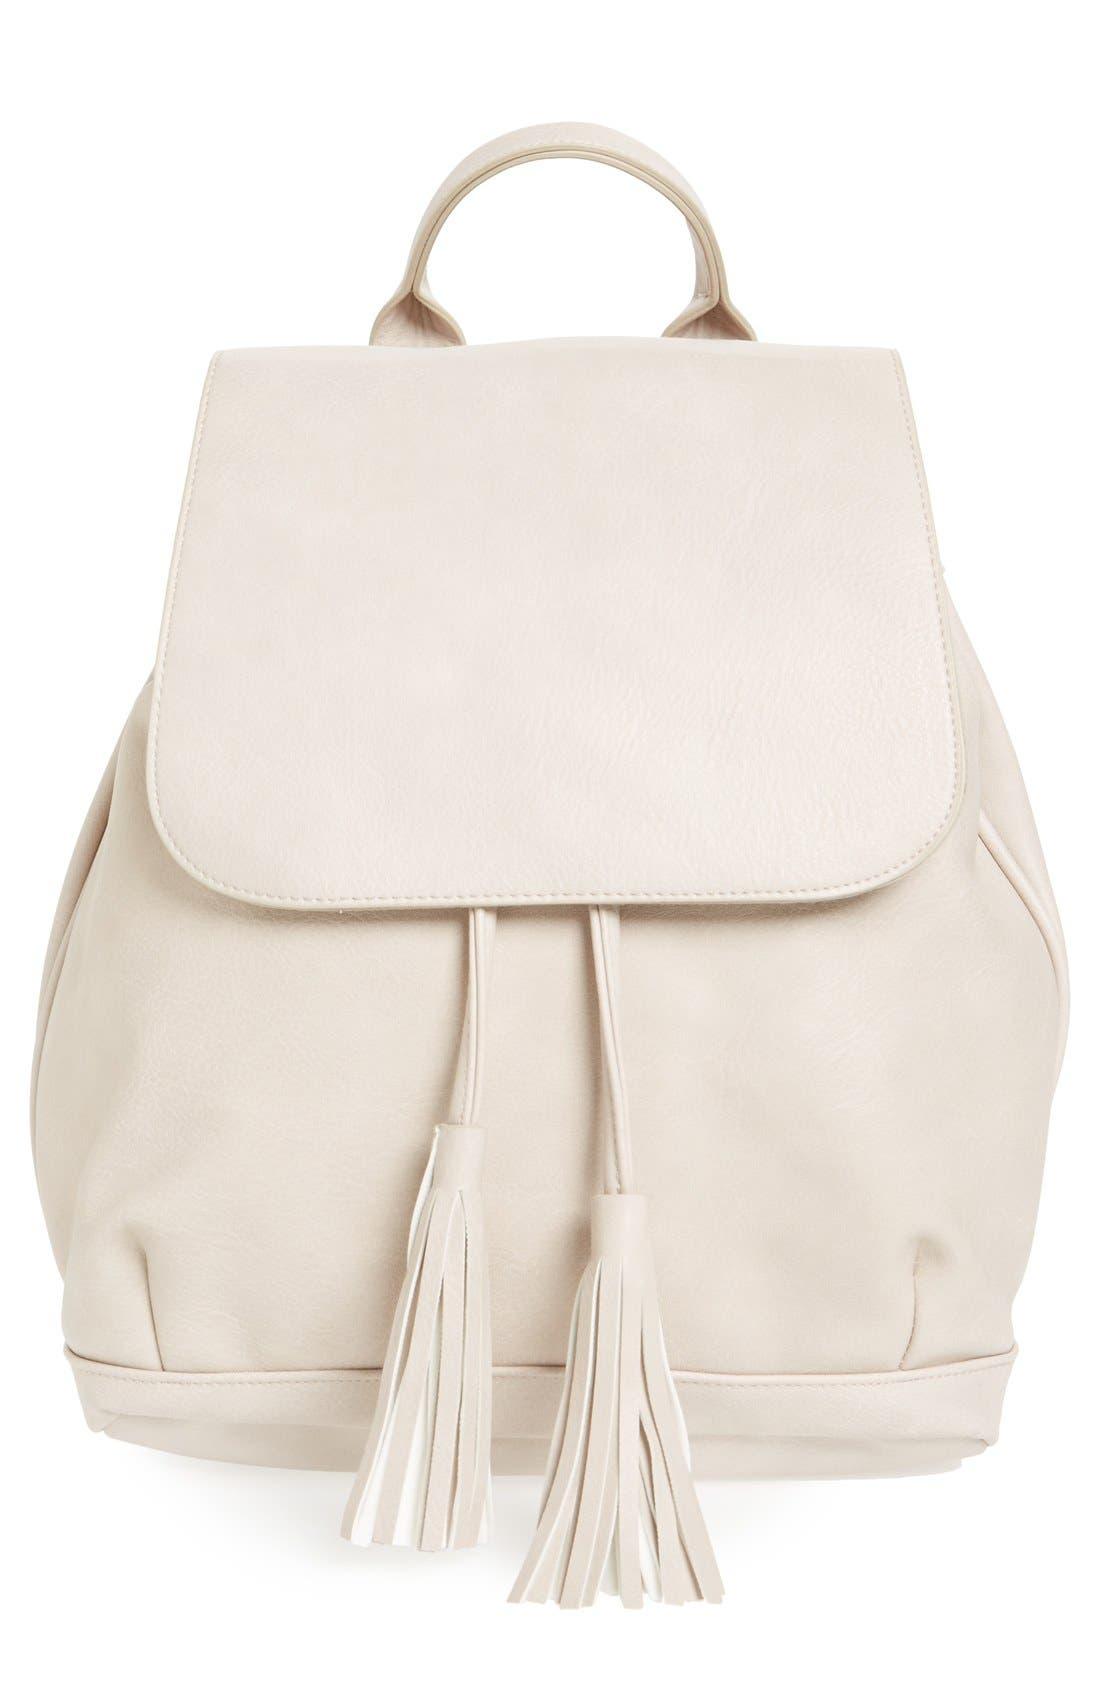 Alternate Image 1 Selected - BP. Tassel Flap Faux Leather Backpack